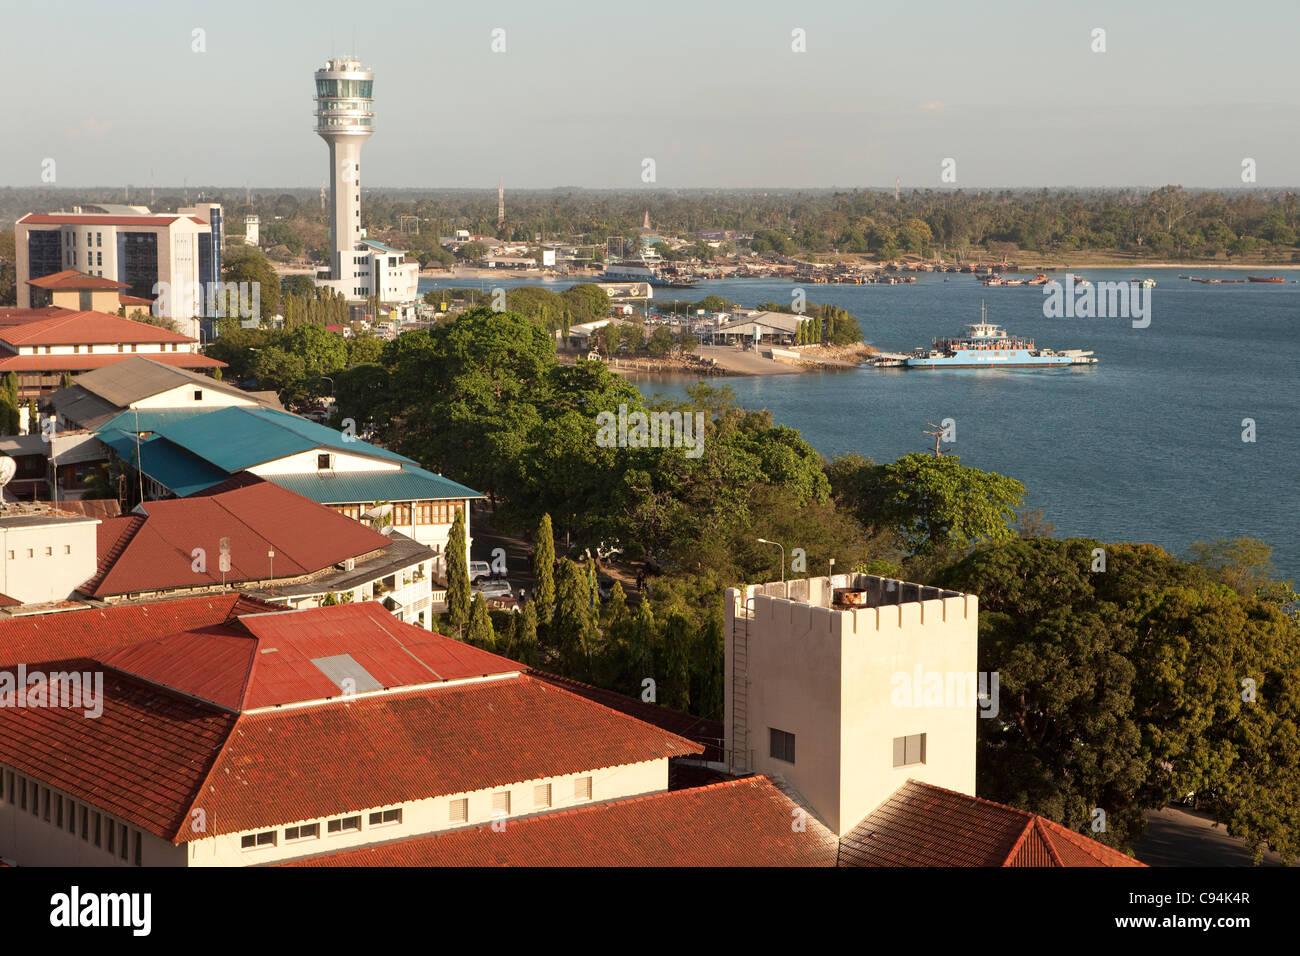 Dar es Salaam Harbour, Tanzania, East Africa - Stock Image